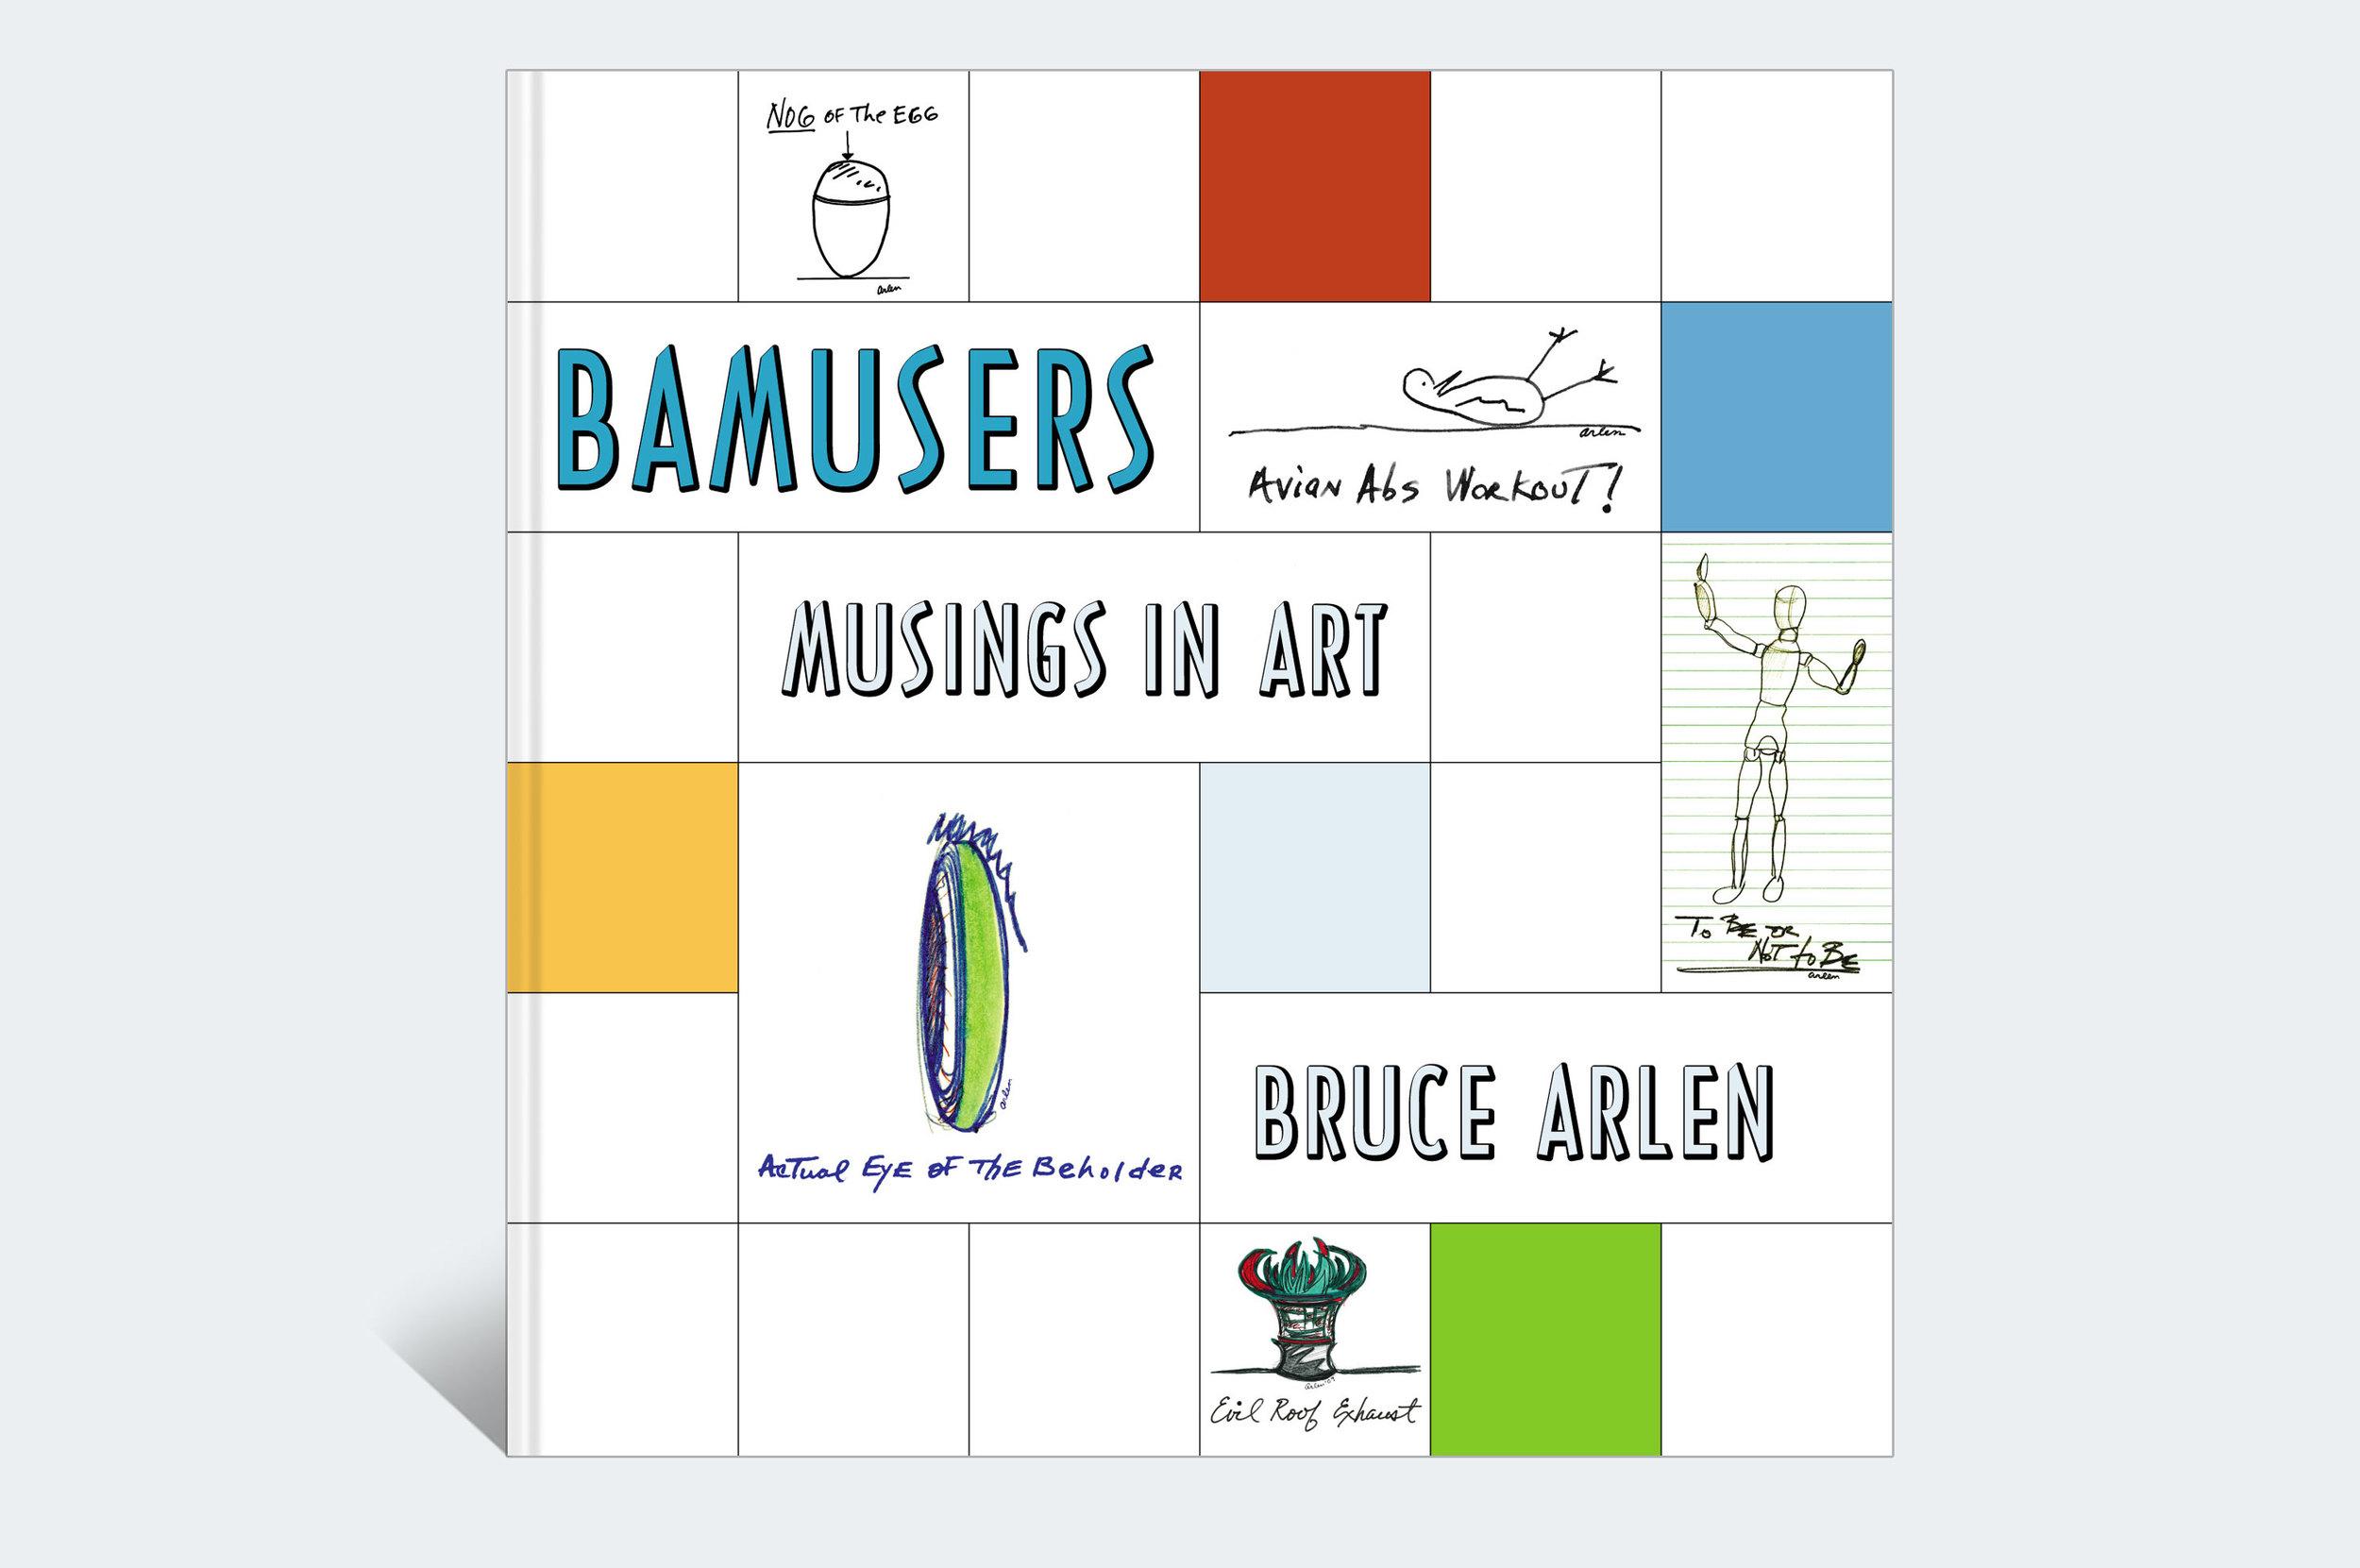 bamusers-book-cover.jpg